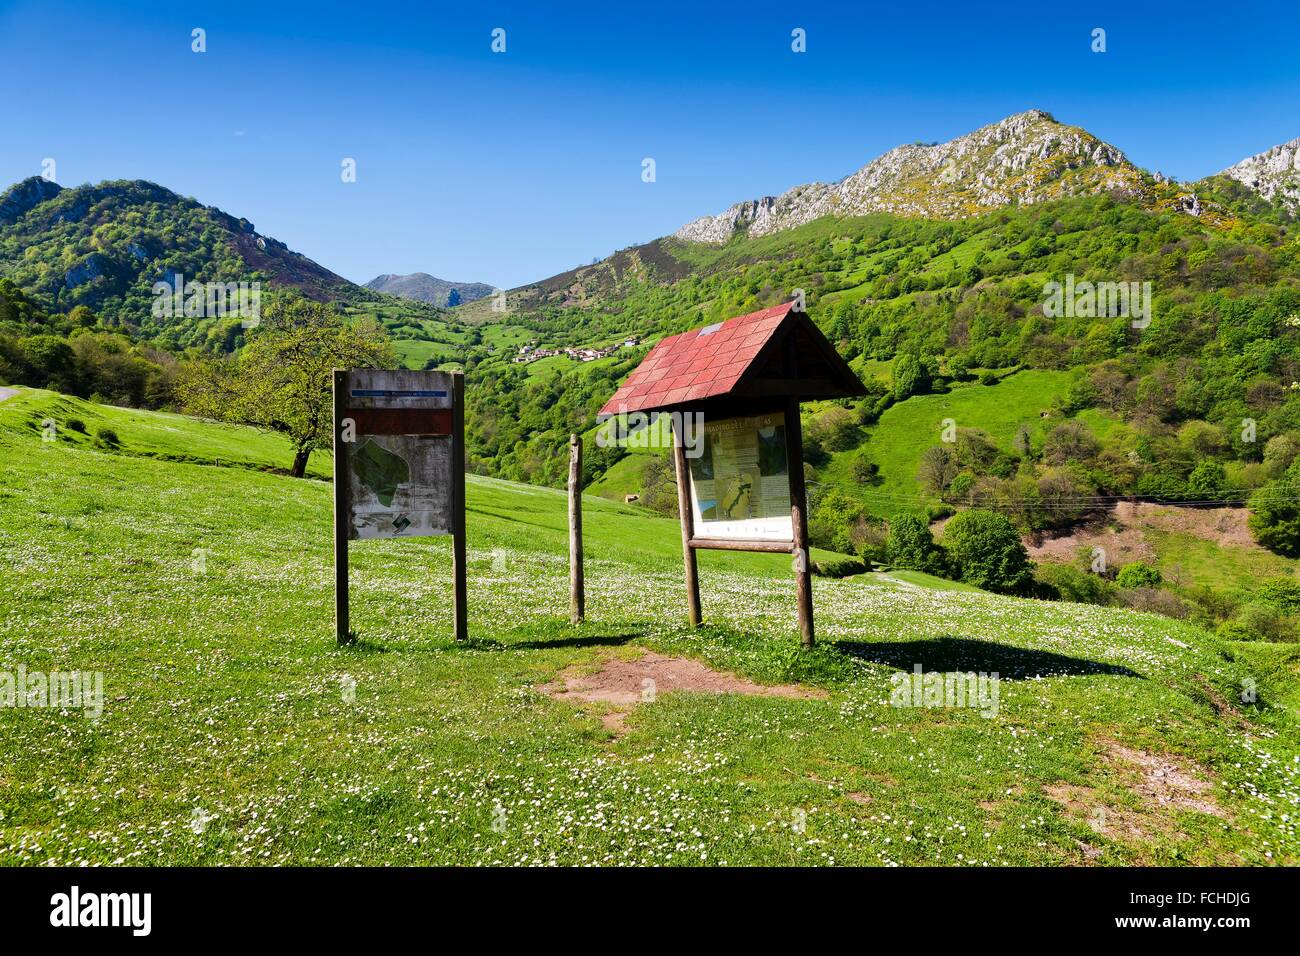 Indicators in Las Xanas. Pedroveya. Asturias. Spain. - Stock Image